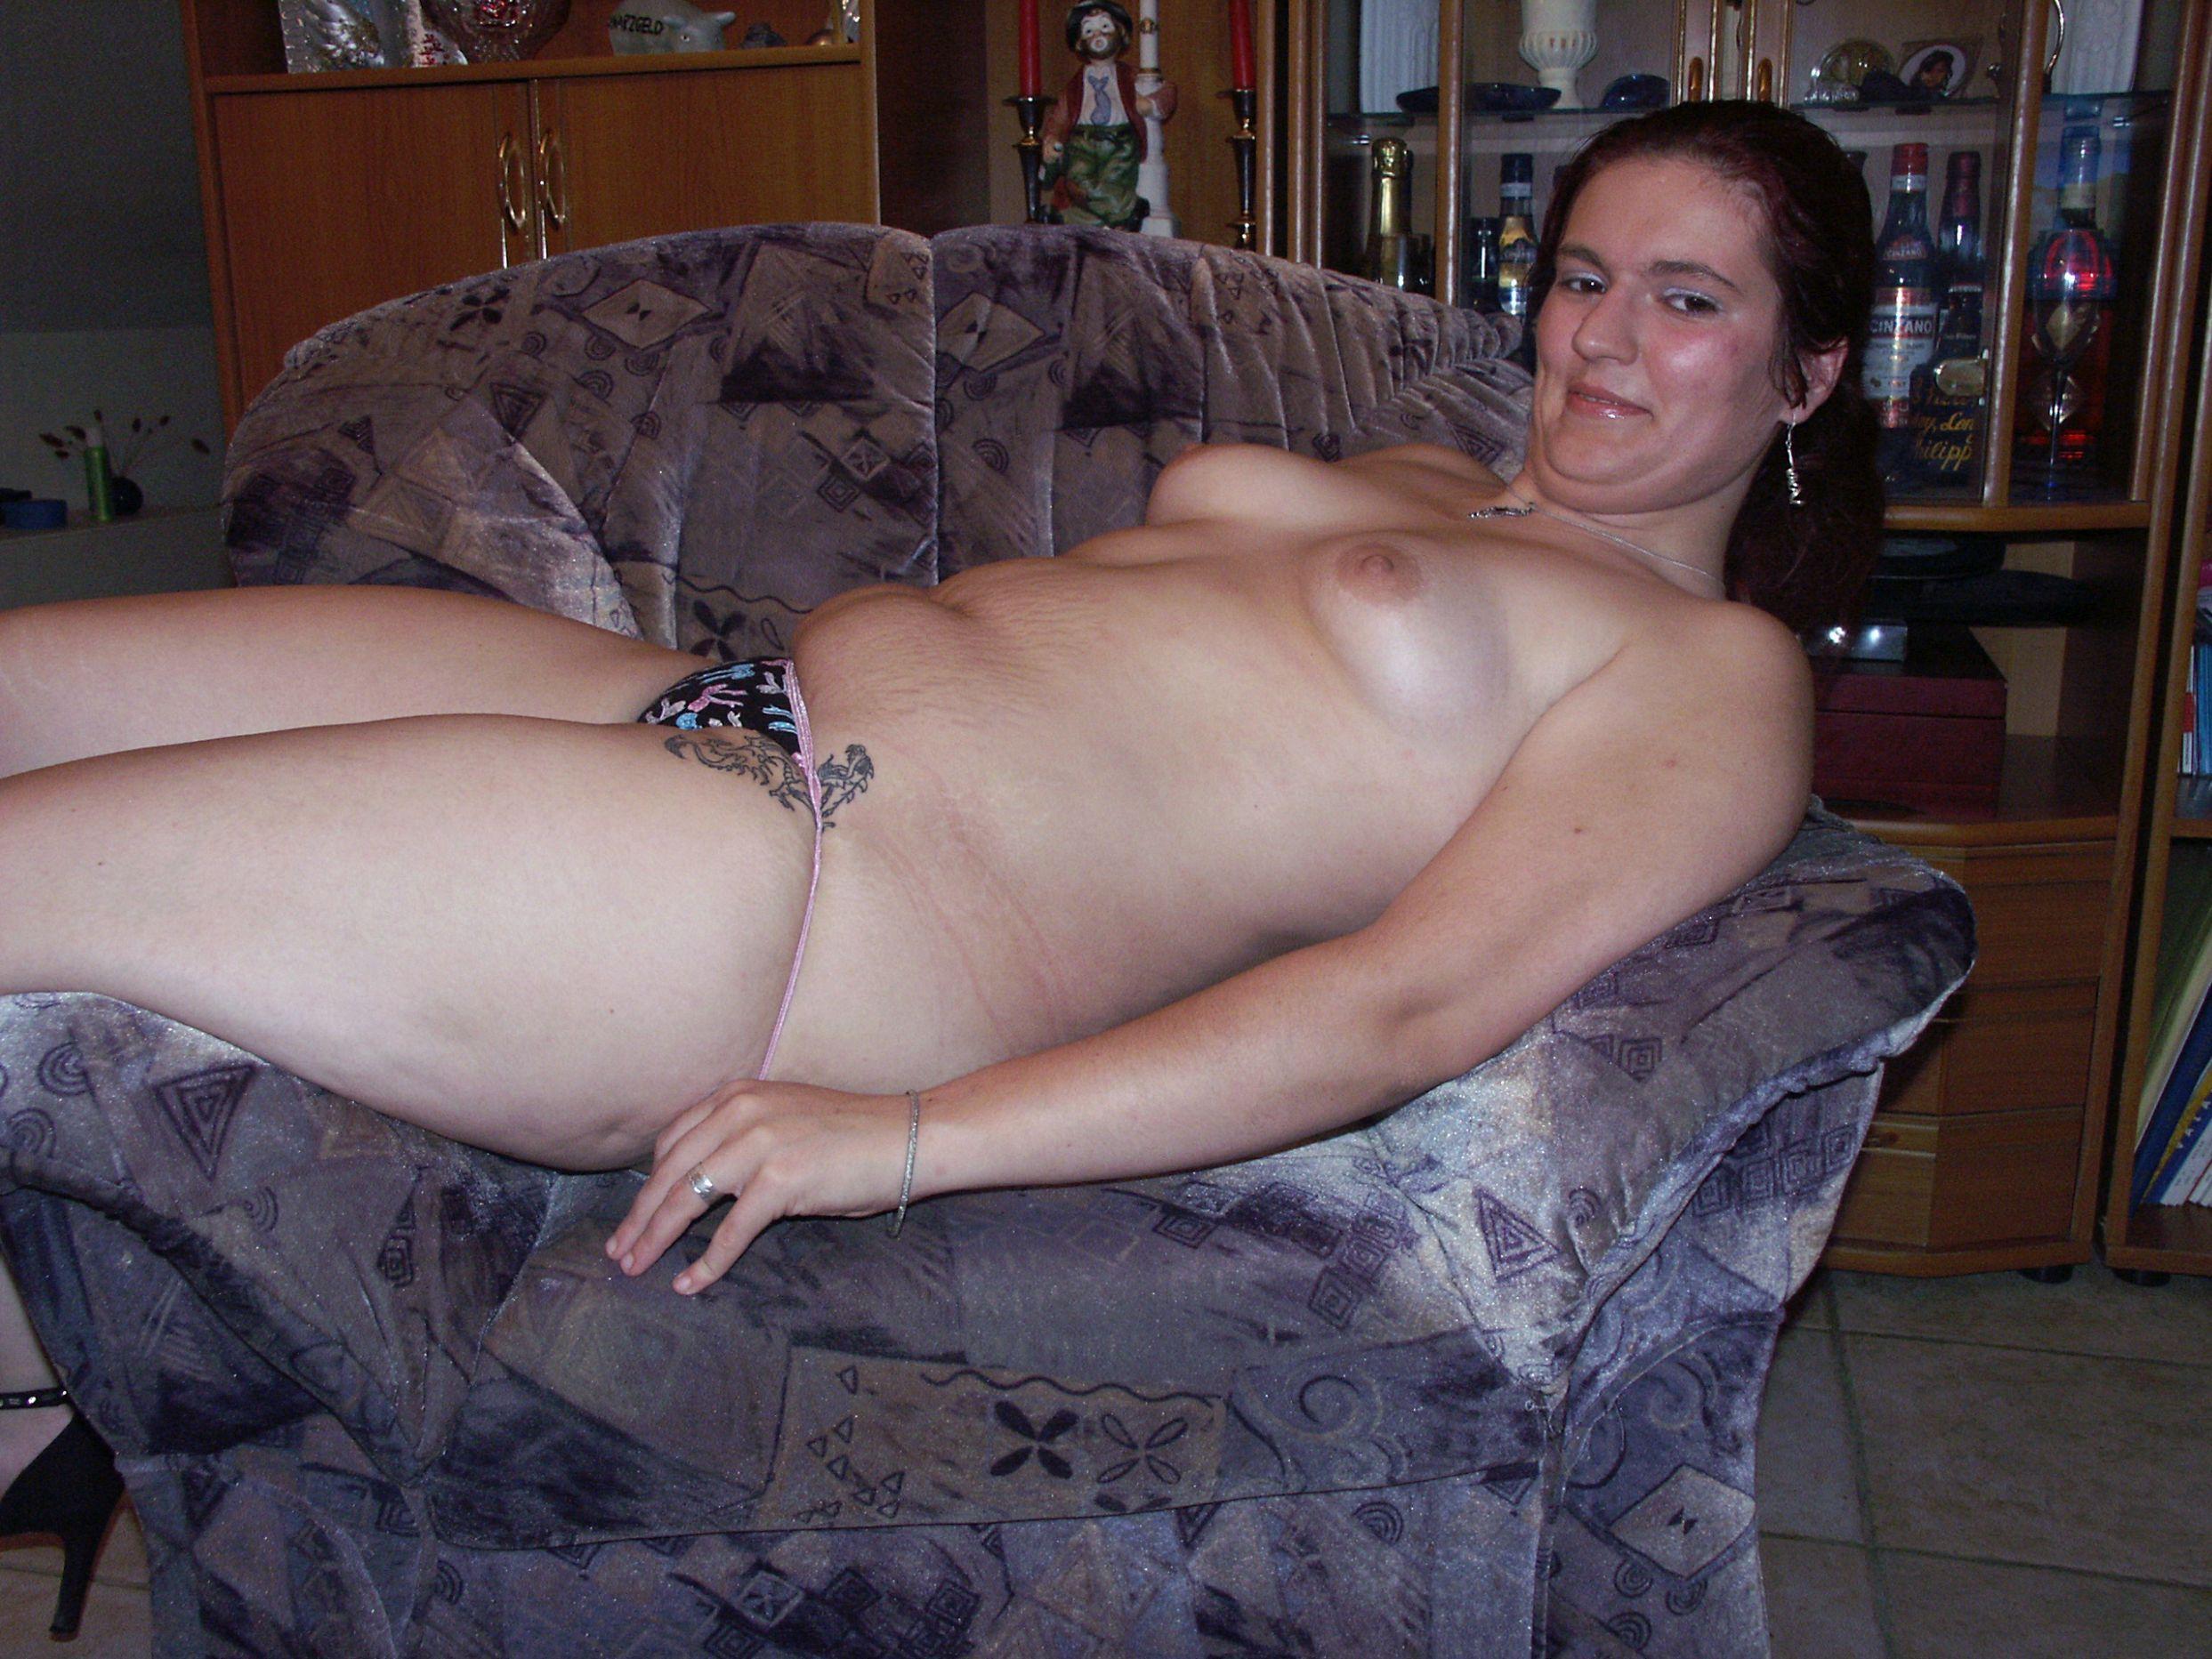 Sexchatportalen